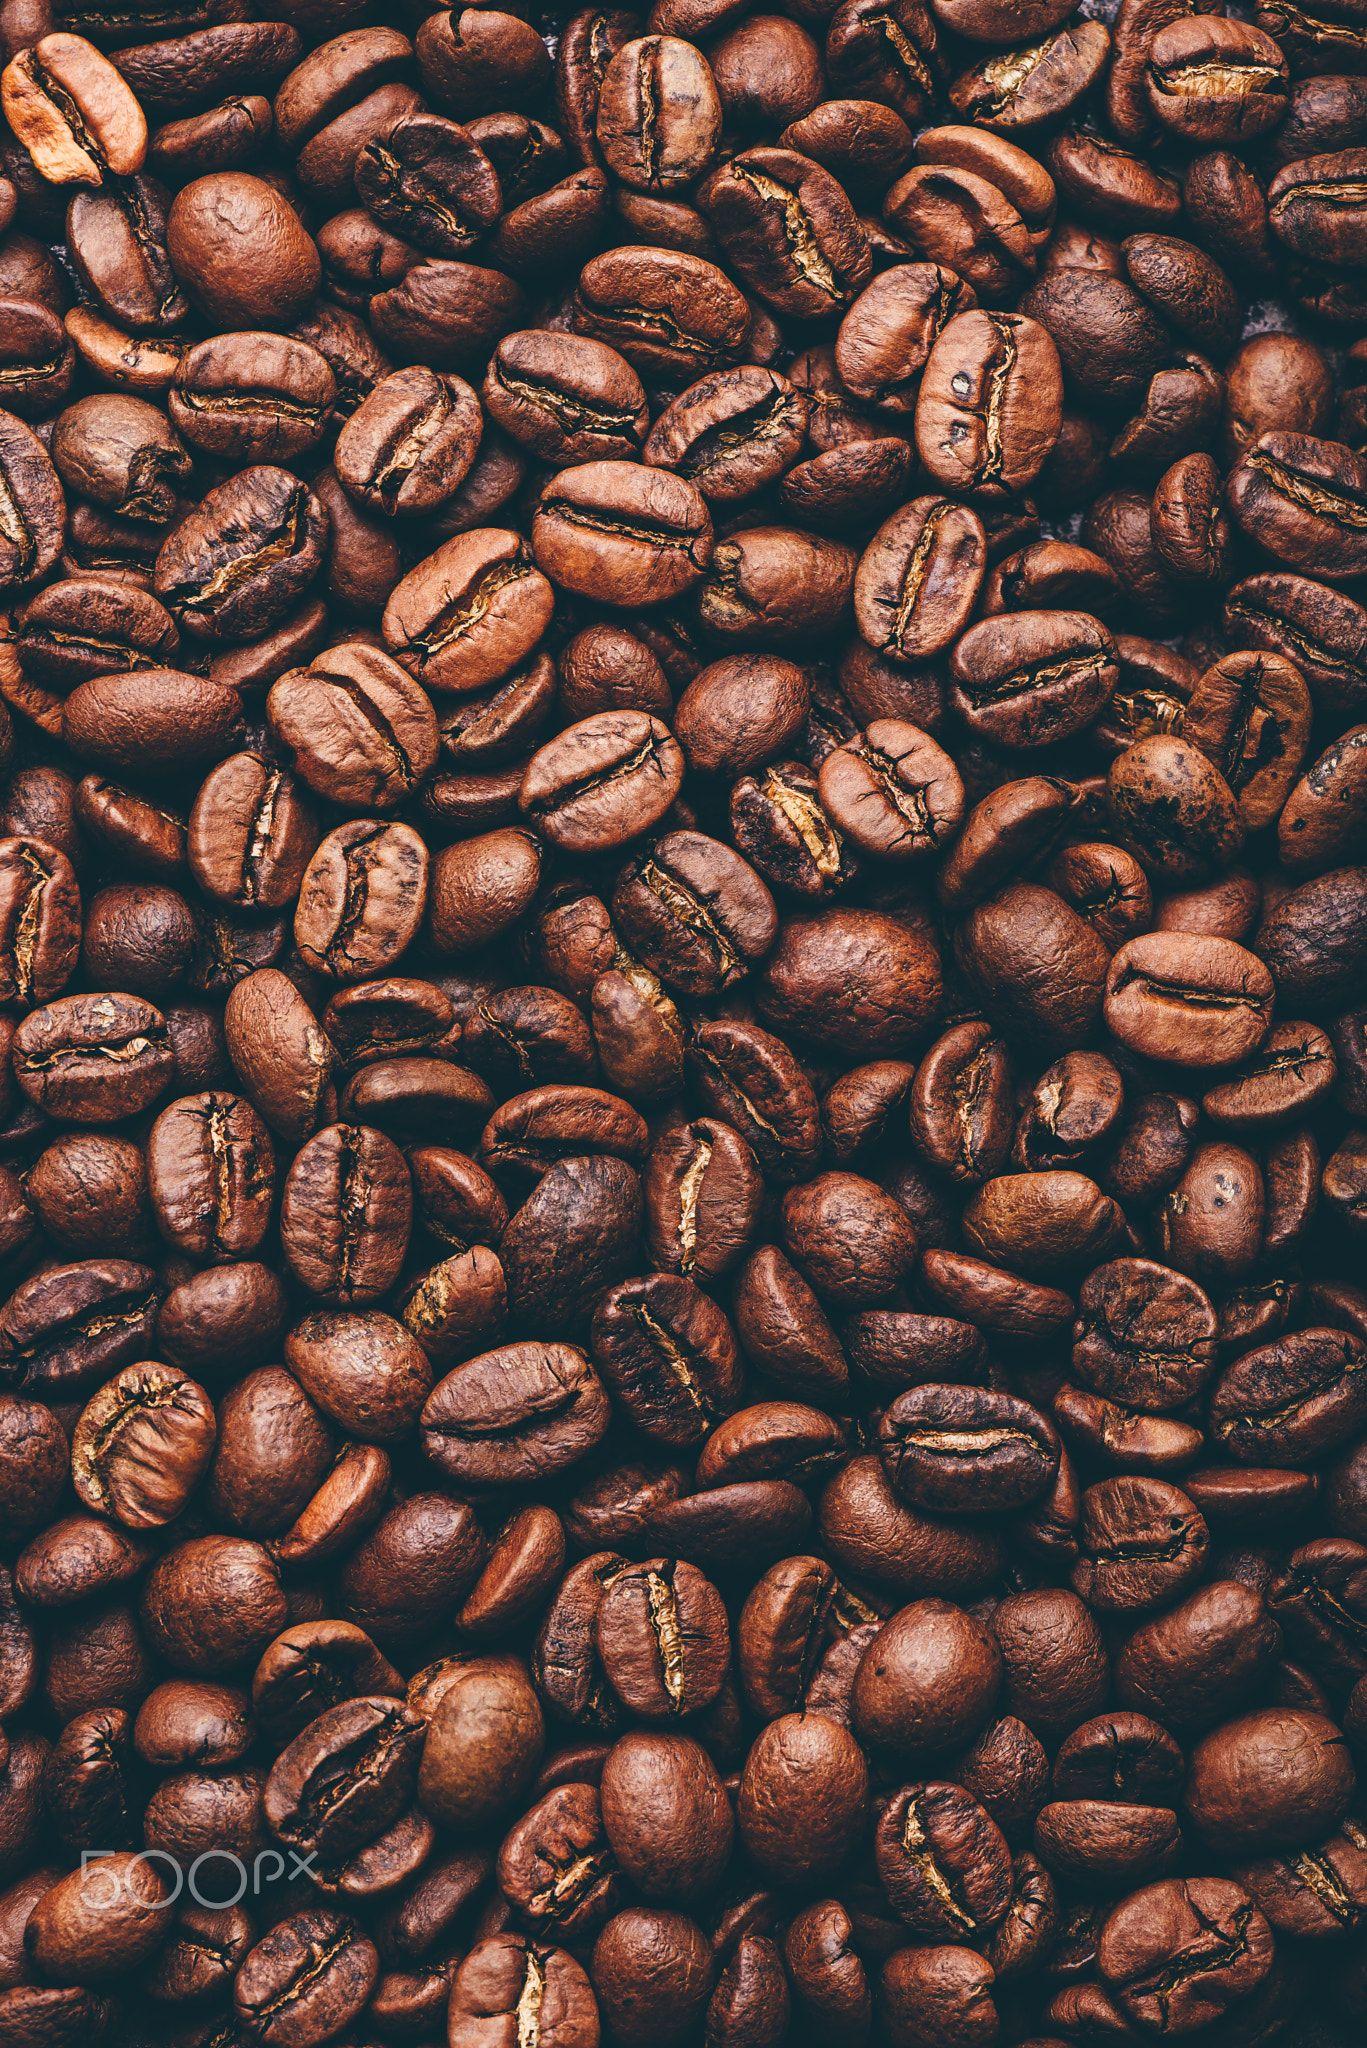 Fresh Roasted Coffee Beans By Seva Blsv Fresh Roasted Coffee Beans Roasted Coffee Beans Coffee Beans Photography Wallpaper coffee beans coffee ice hand